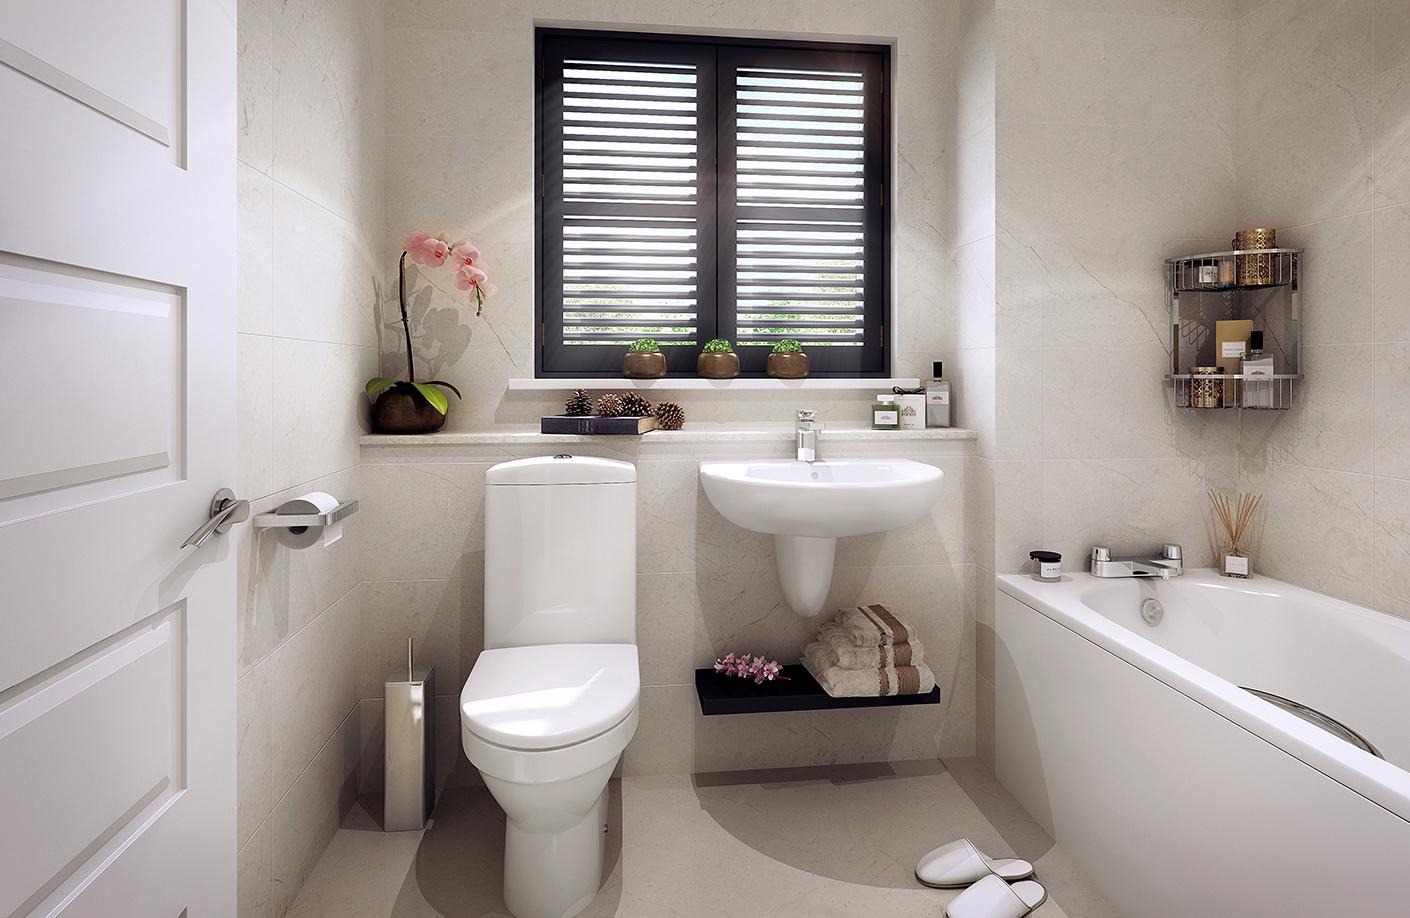 B1-Bathroom-1920.jpg